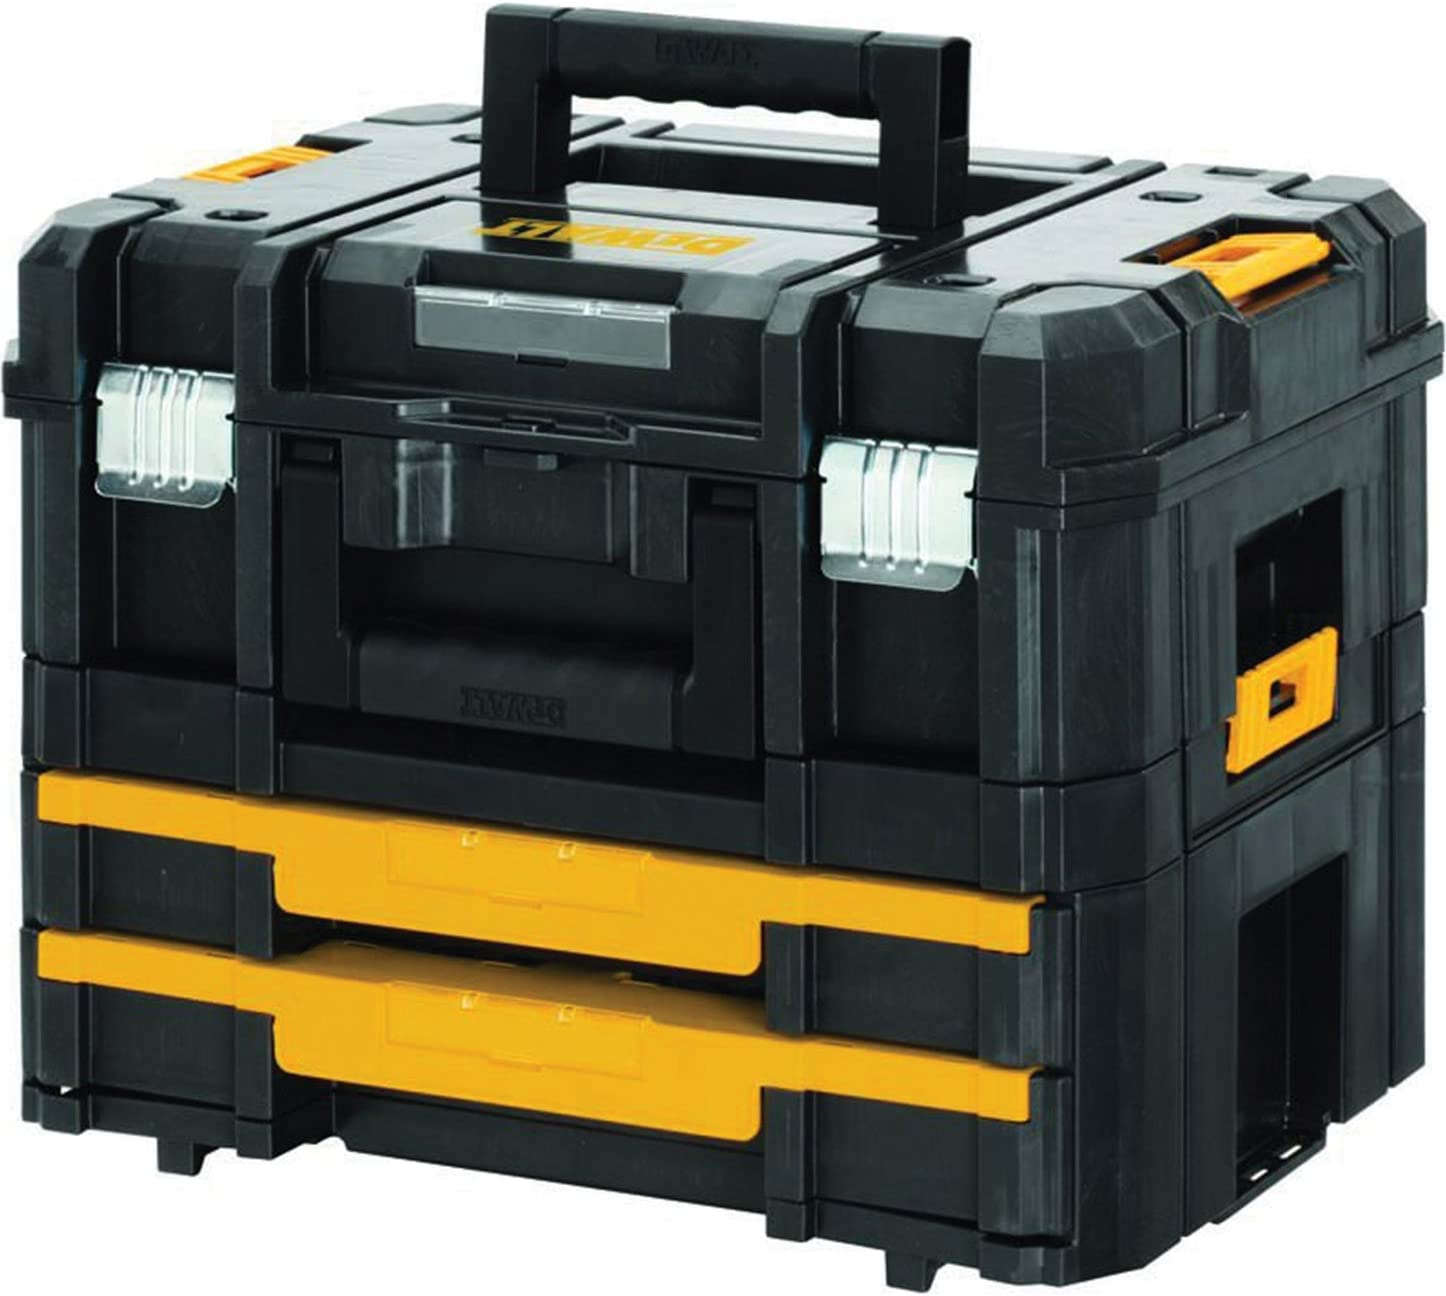 Advanced DeWalt TSTAK II + VI apilables y caja de herramientas 440 ...